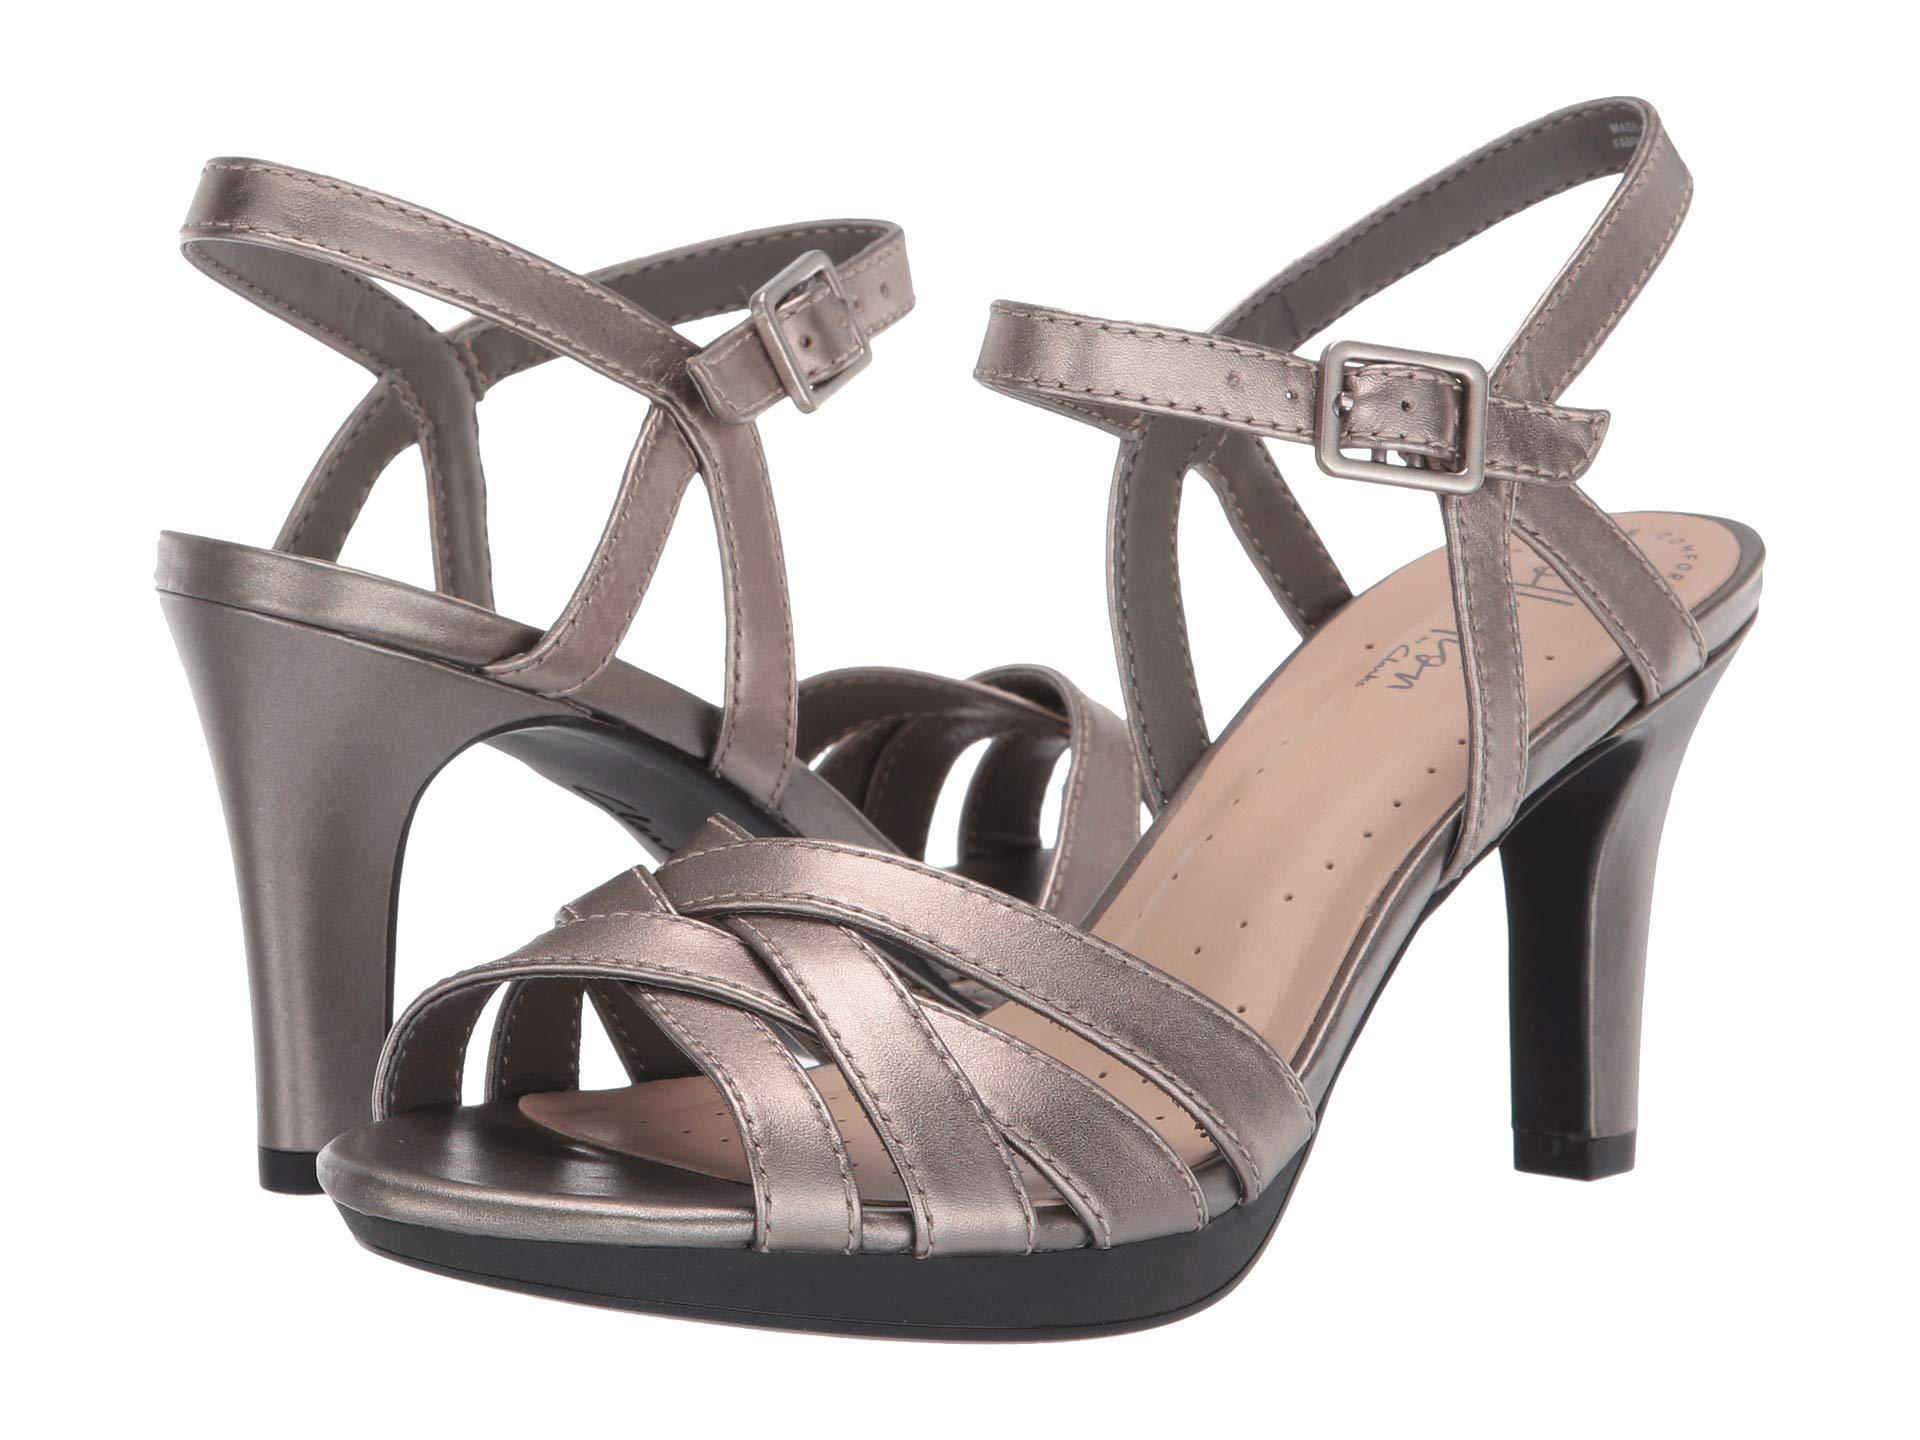 38d2095ab4e Clarks. Women s Adriel Wavy (pewter Leather) High Heels